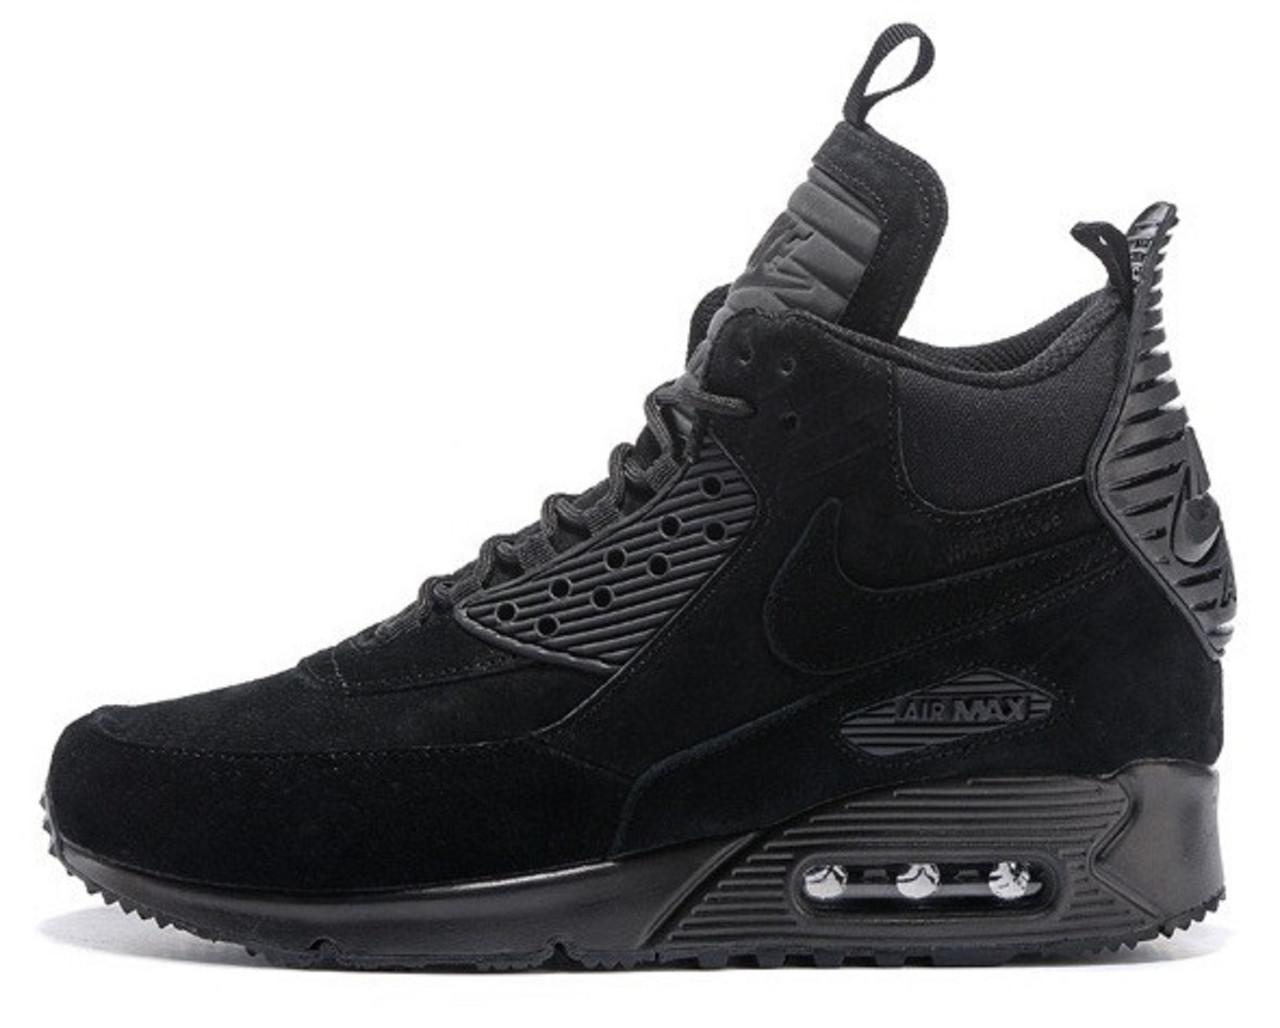 Мужские кроссовки Nike Air Max Sneakerboots 90 Black (найк аир макс 90,  черные) 54d71421fad